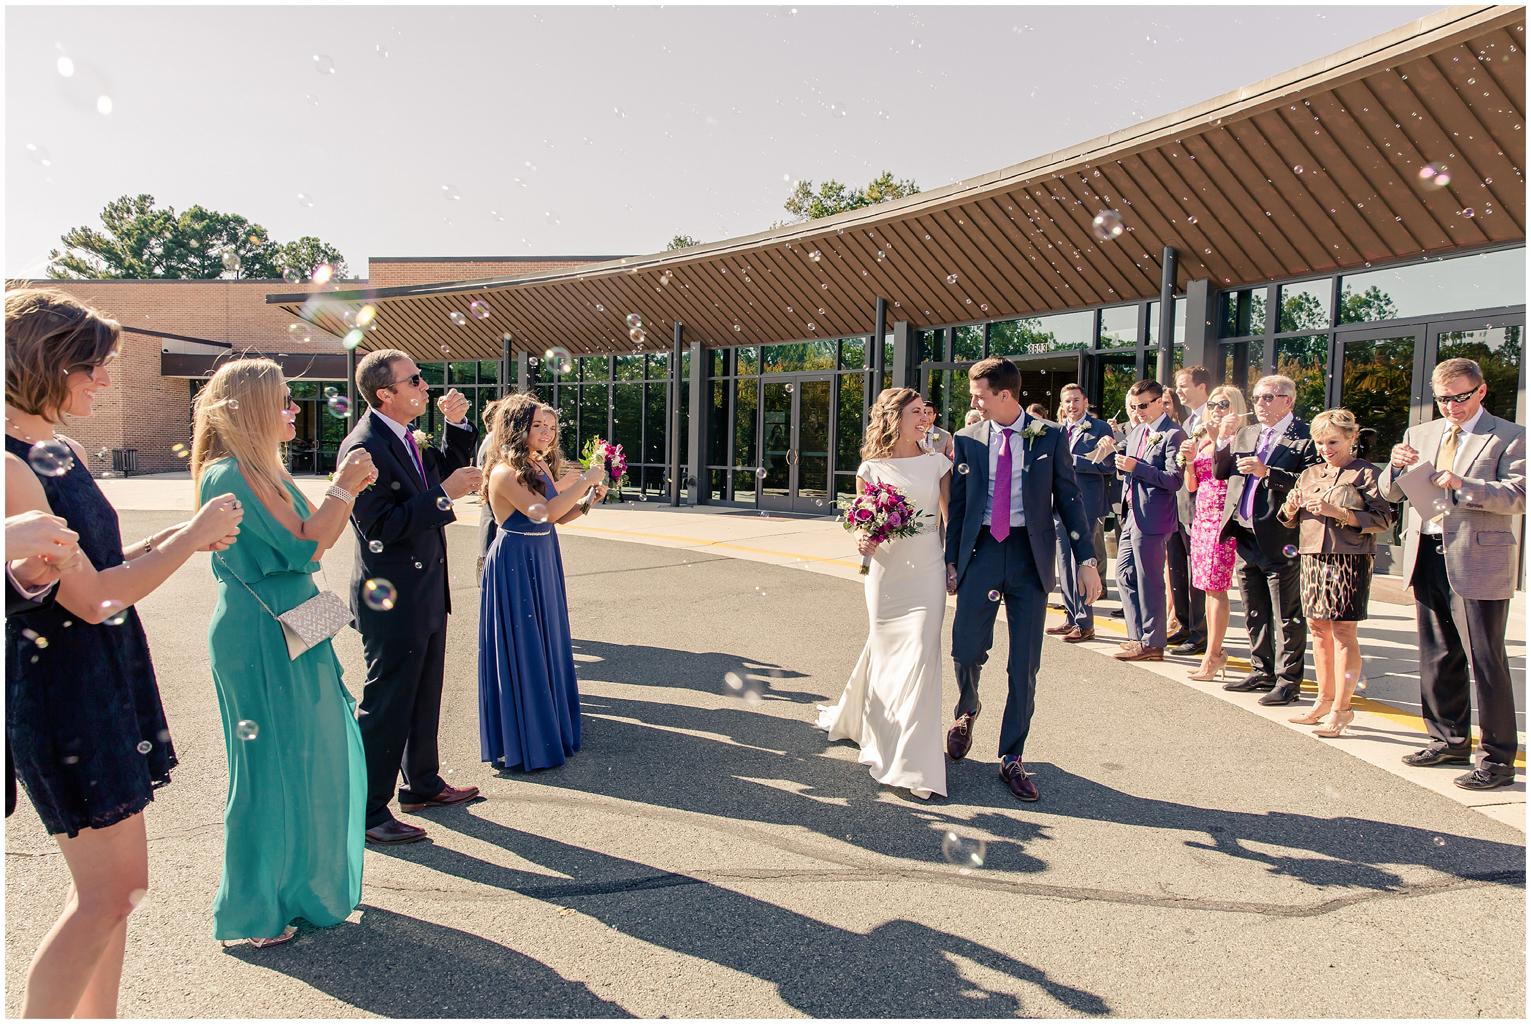 ritz-carlton-georgetown-wedding-washington-dc-photography-liz-stewart-photo-00025